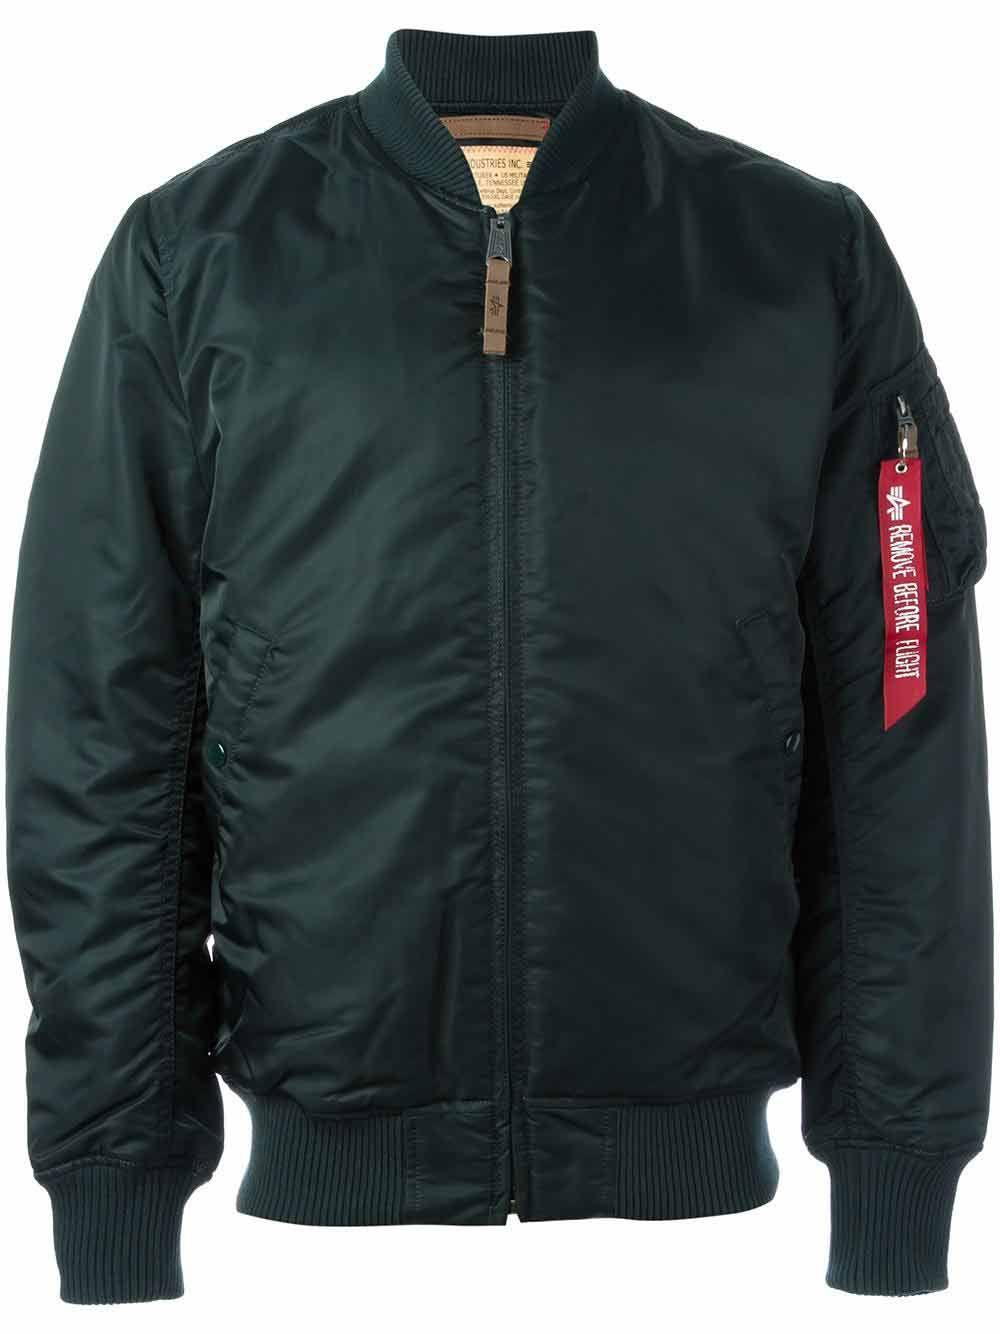 Latest Winter Jackets For Men In Pakistan 2019 Men Clothing